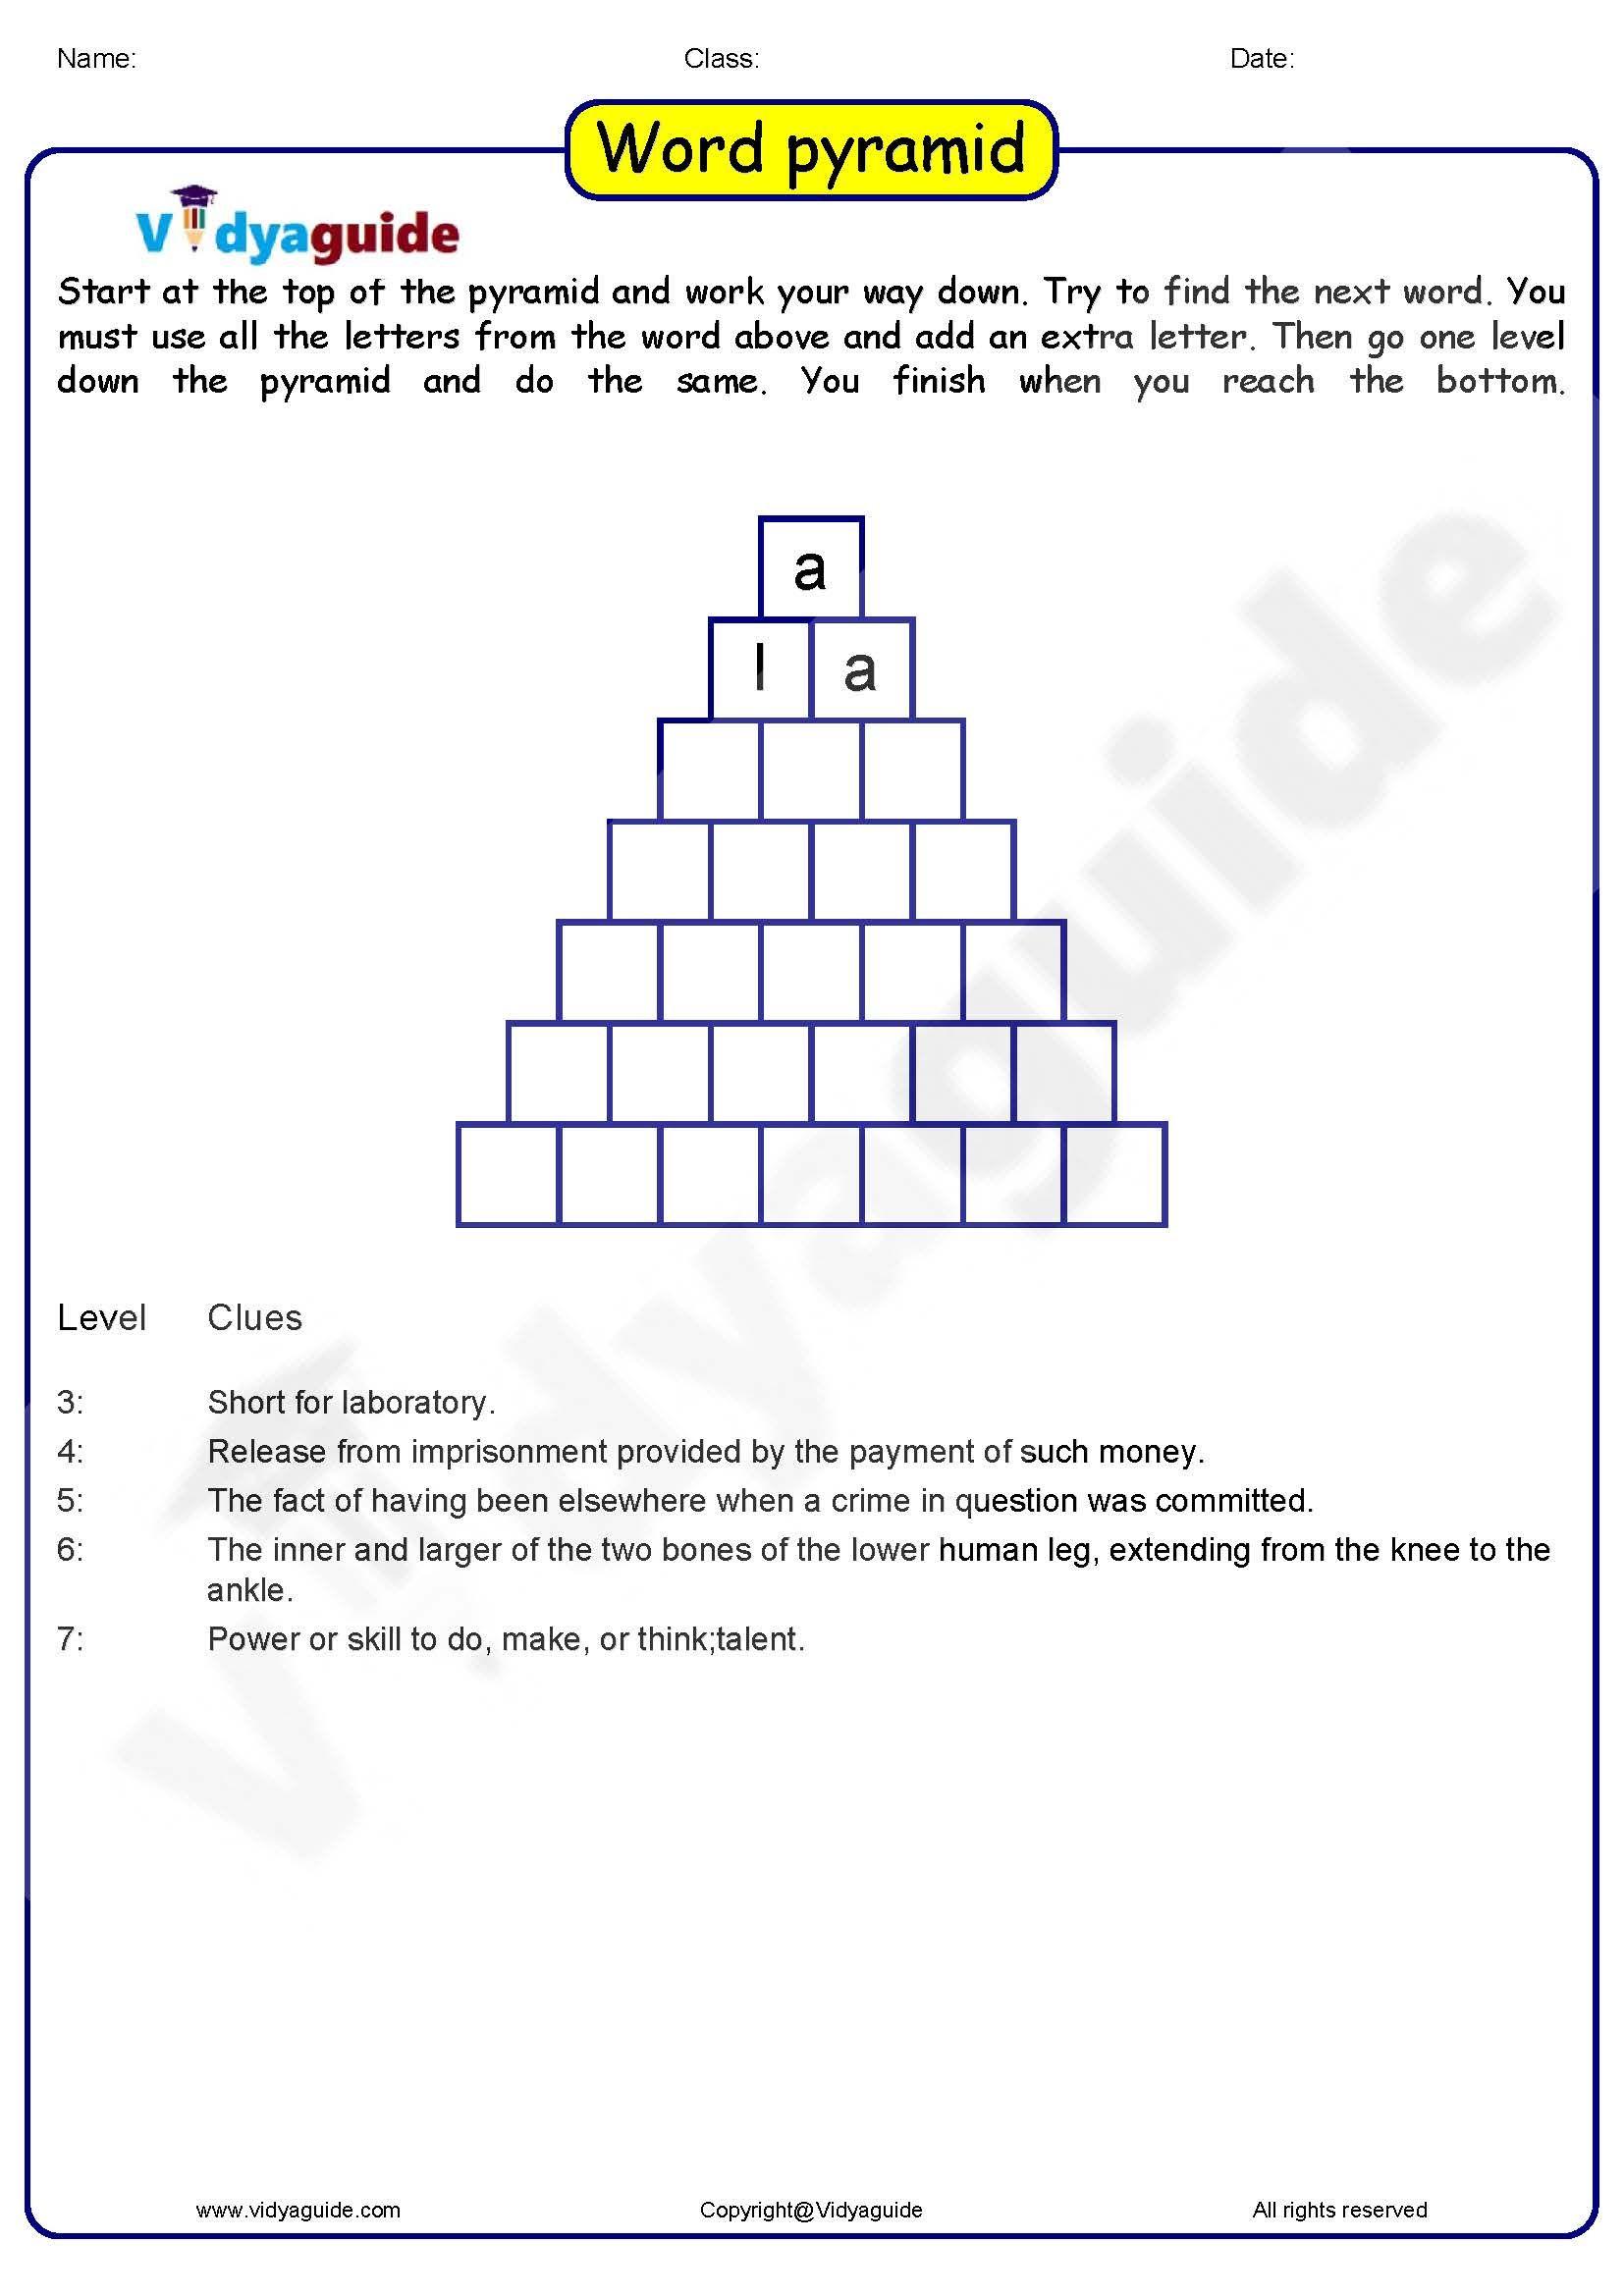 Word Pyramid 01